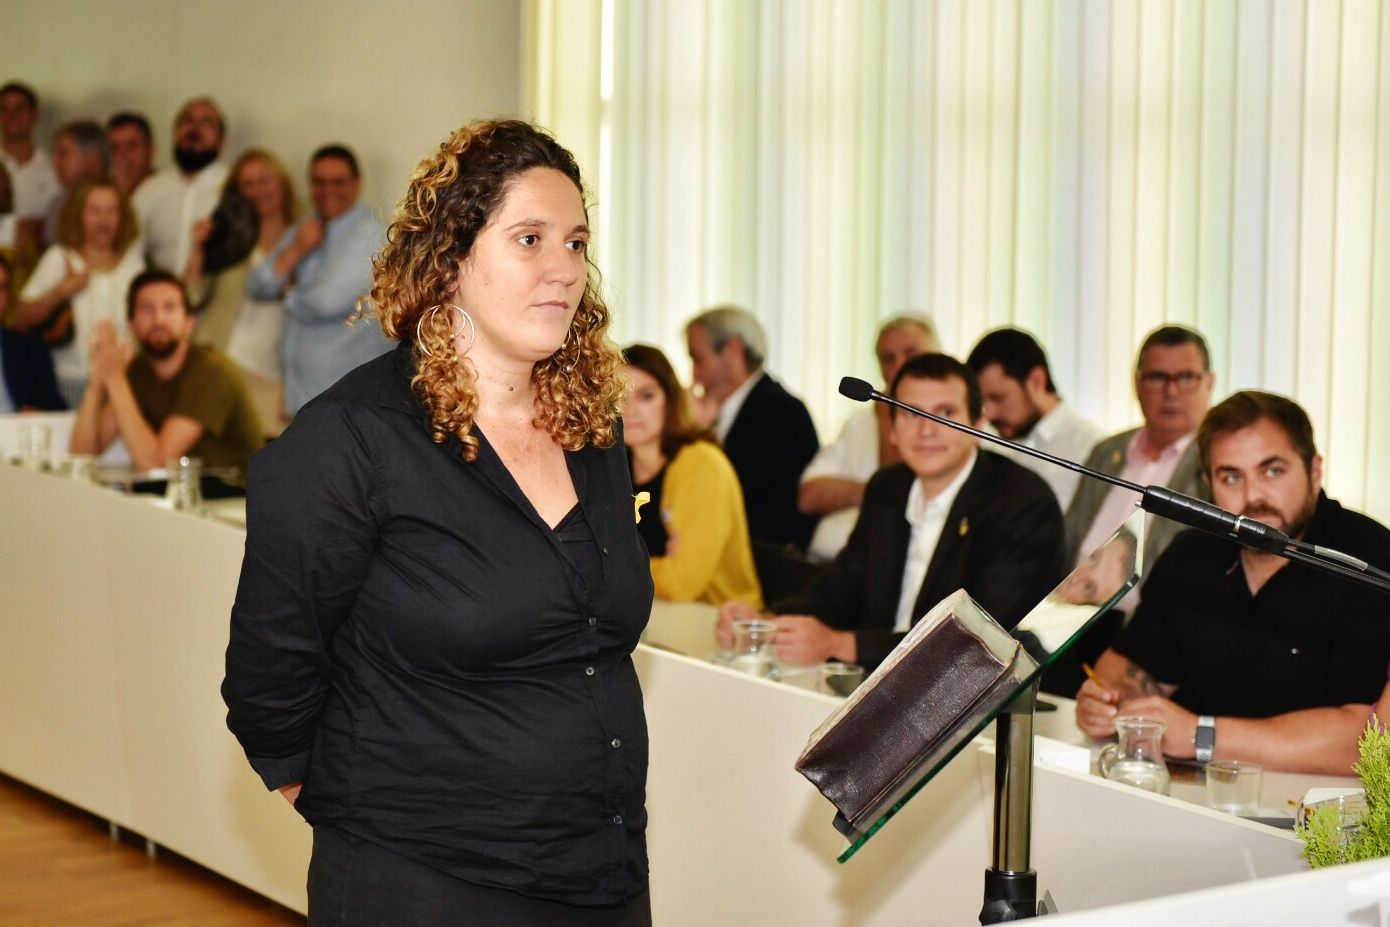 Núria Gibert, portaveu de la CUP. FOTO: Miguel López Mallach